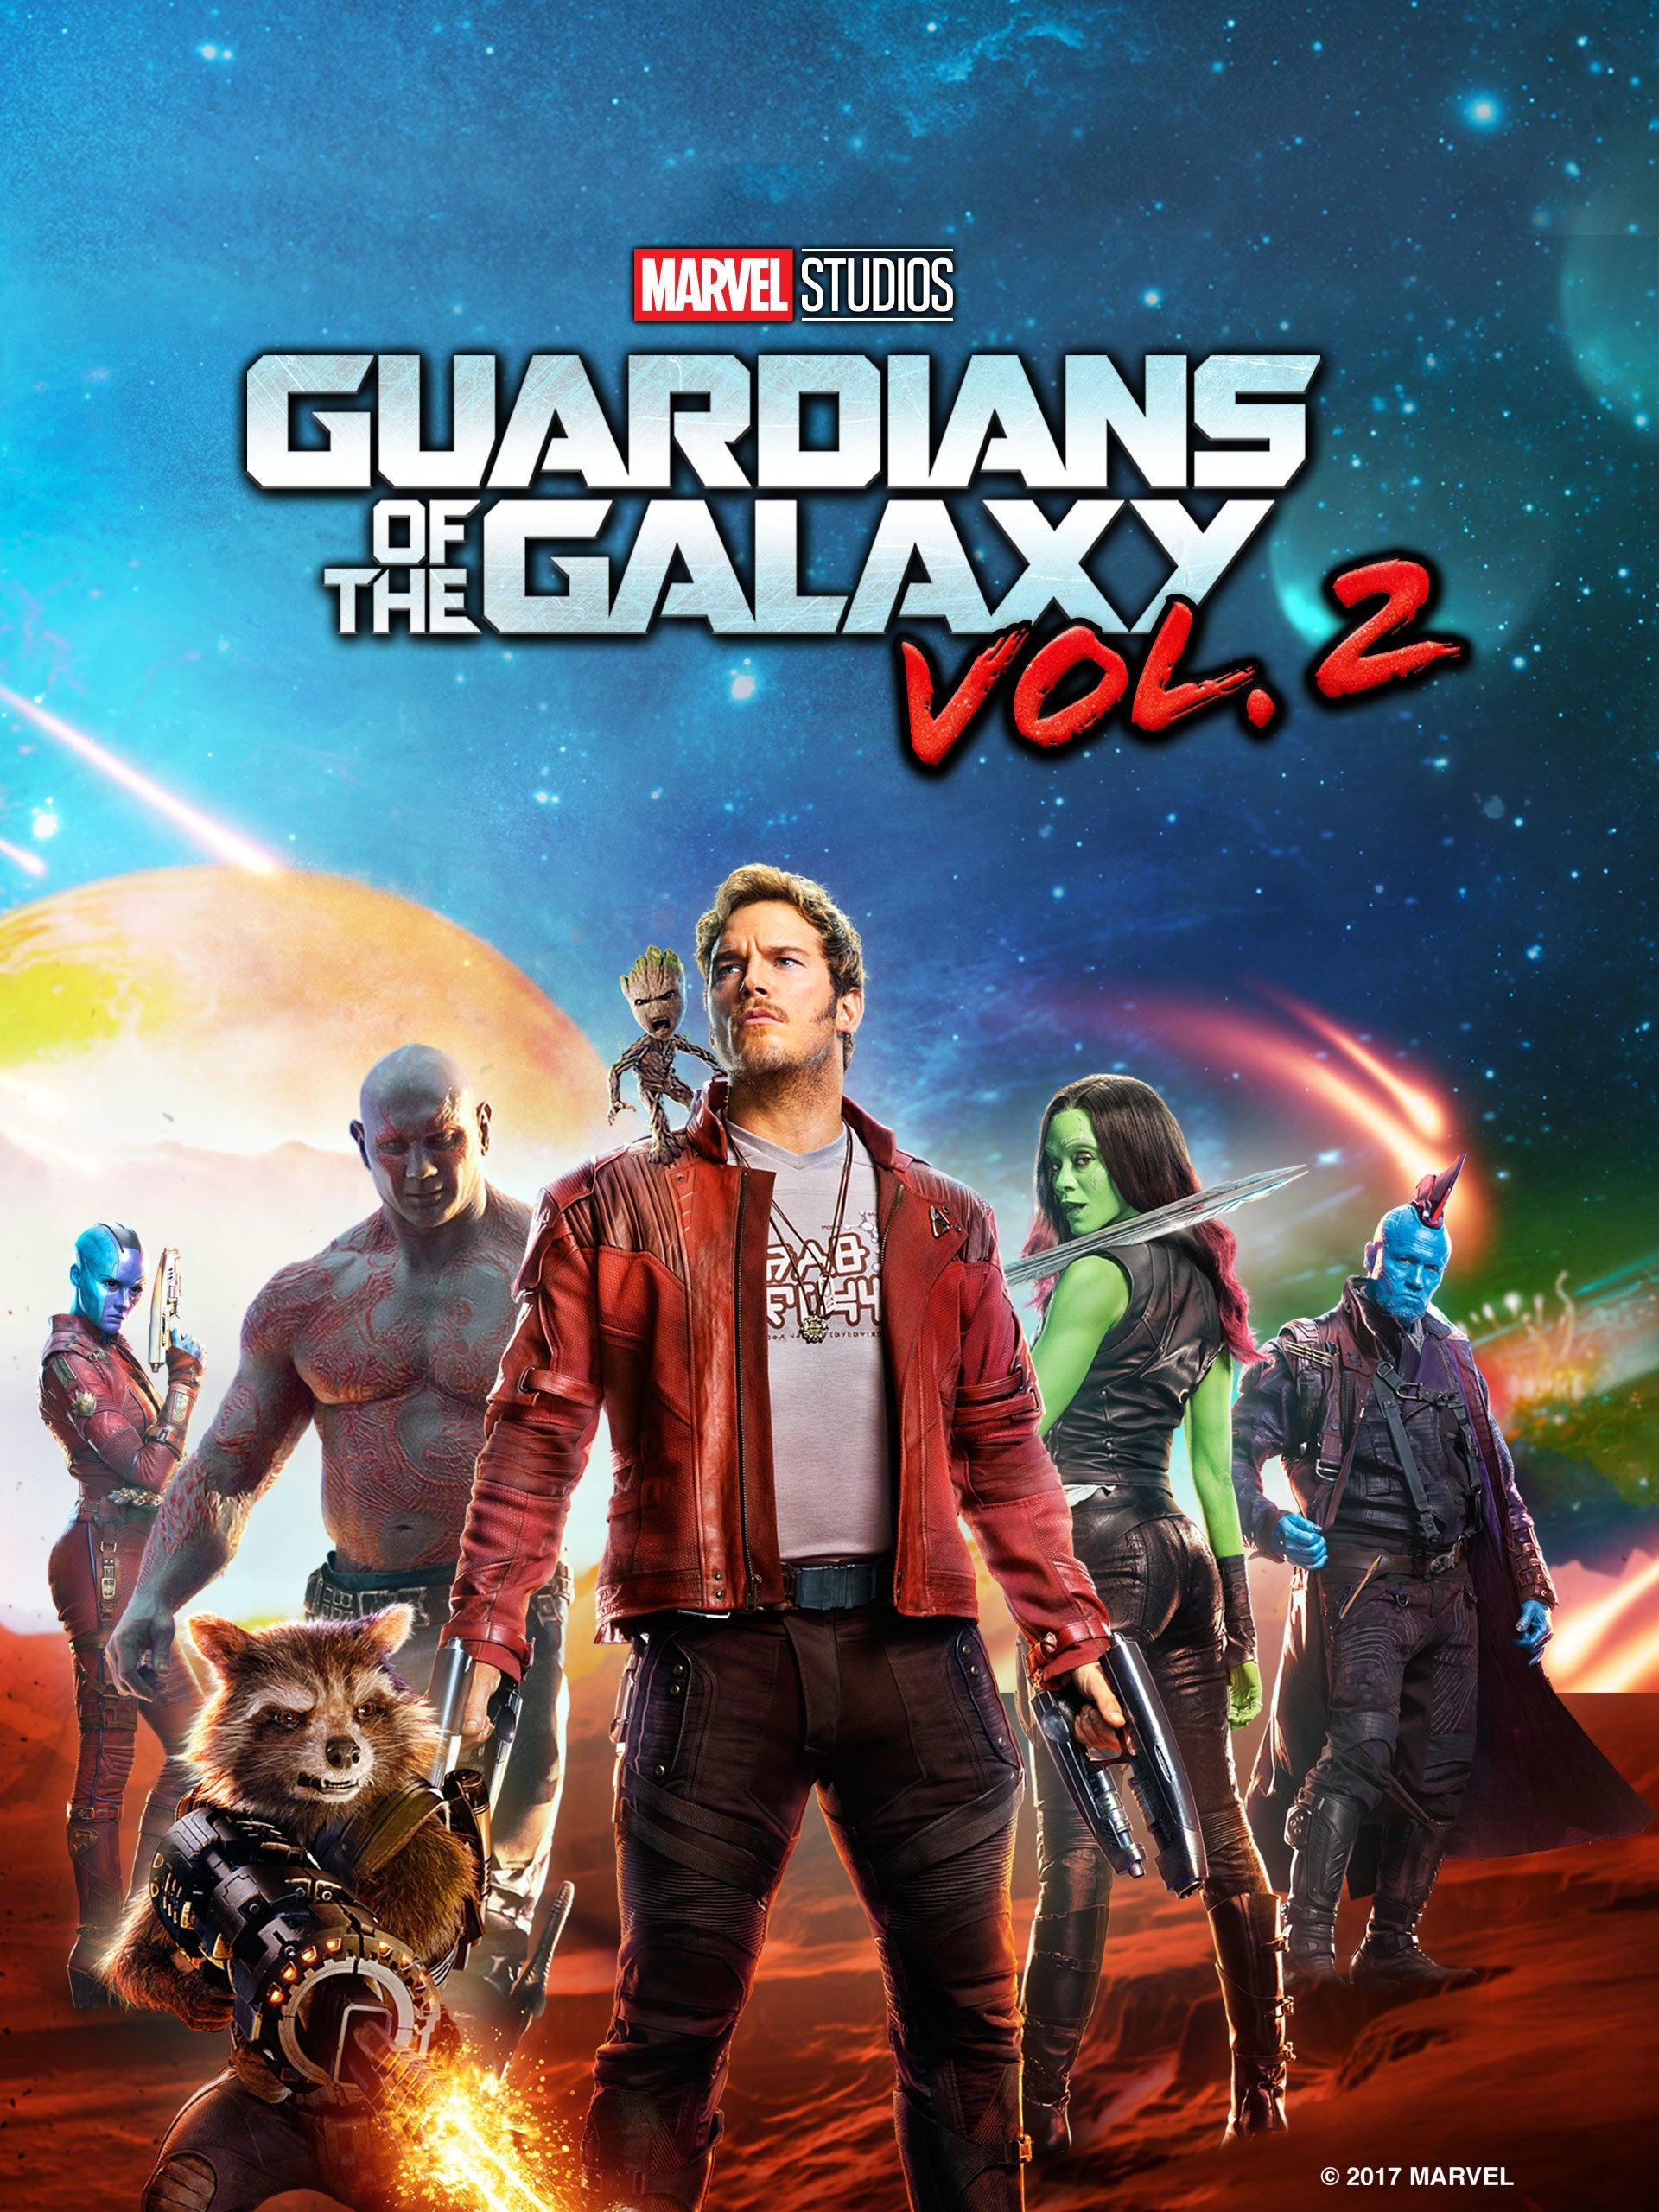 Guardians of the Galaxy, Vol. 2 - $2.58 (AC) - HDX Google Play (ports to Vudu/Amazon/iTunes/FandangoNow)